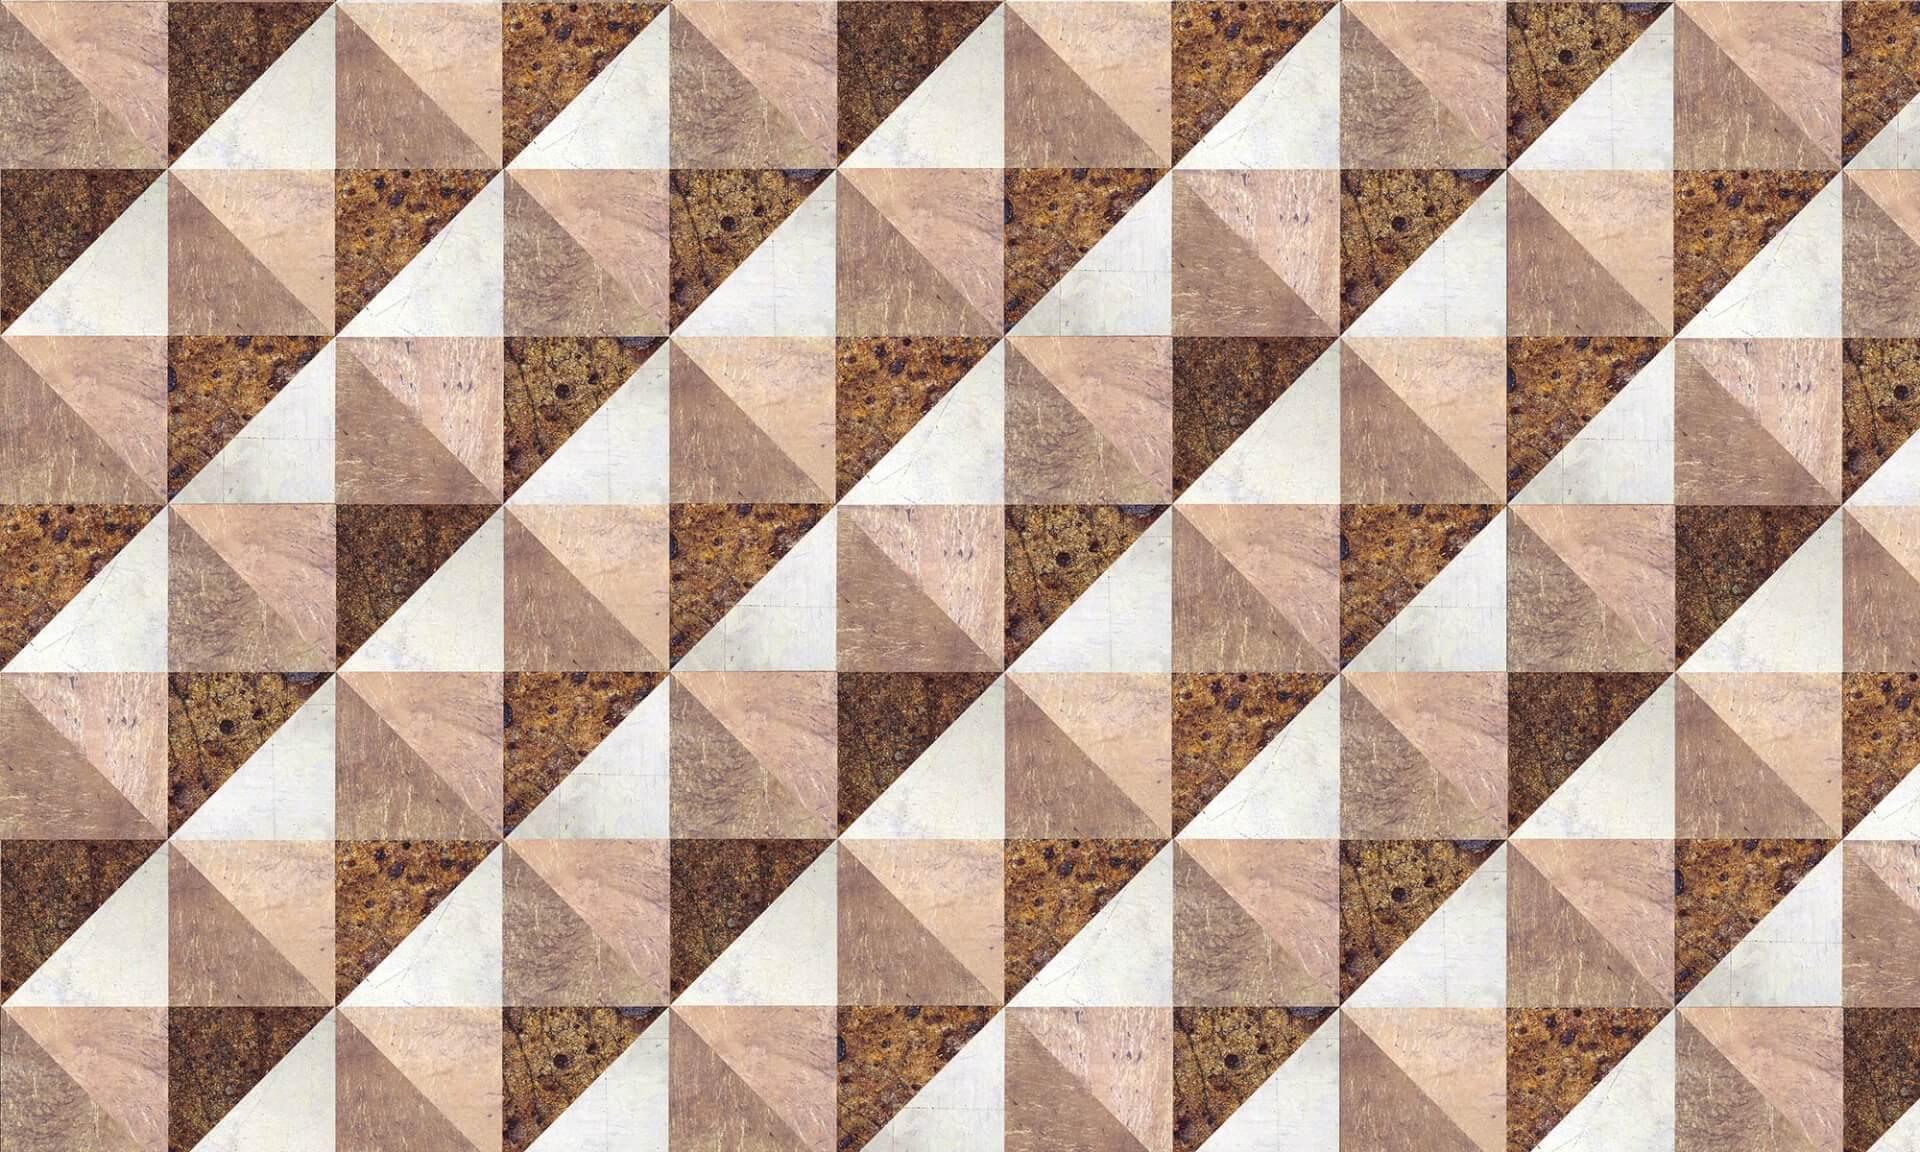 3-D Metal Leaf Pyramid Doug Garrabrants